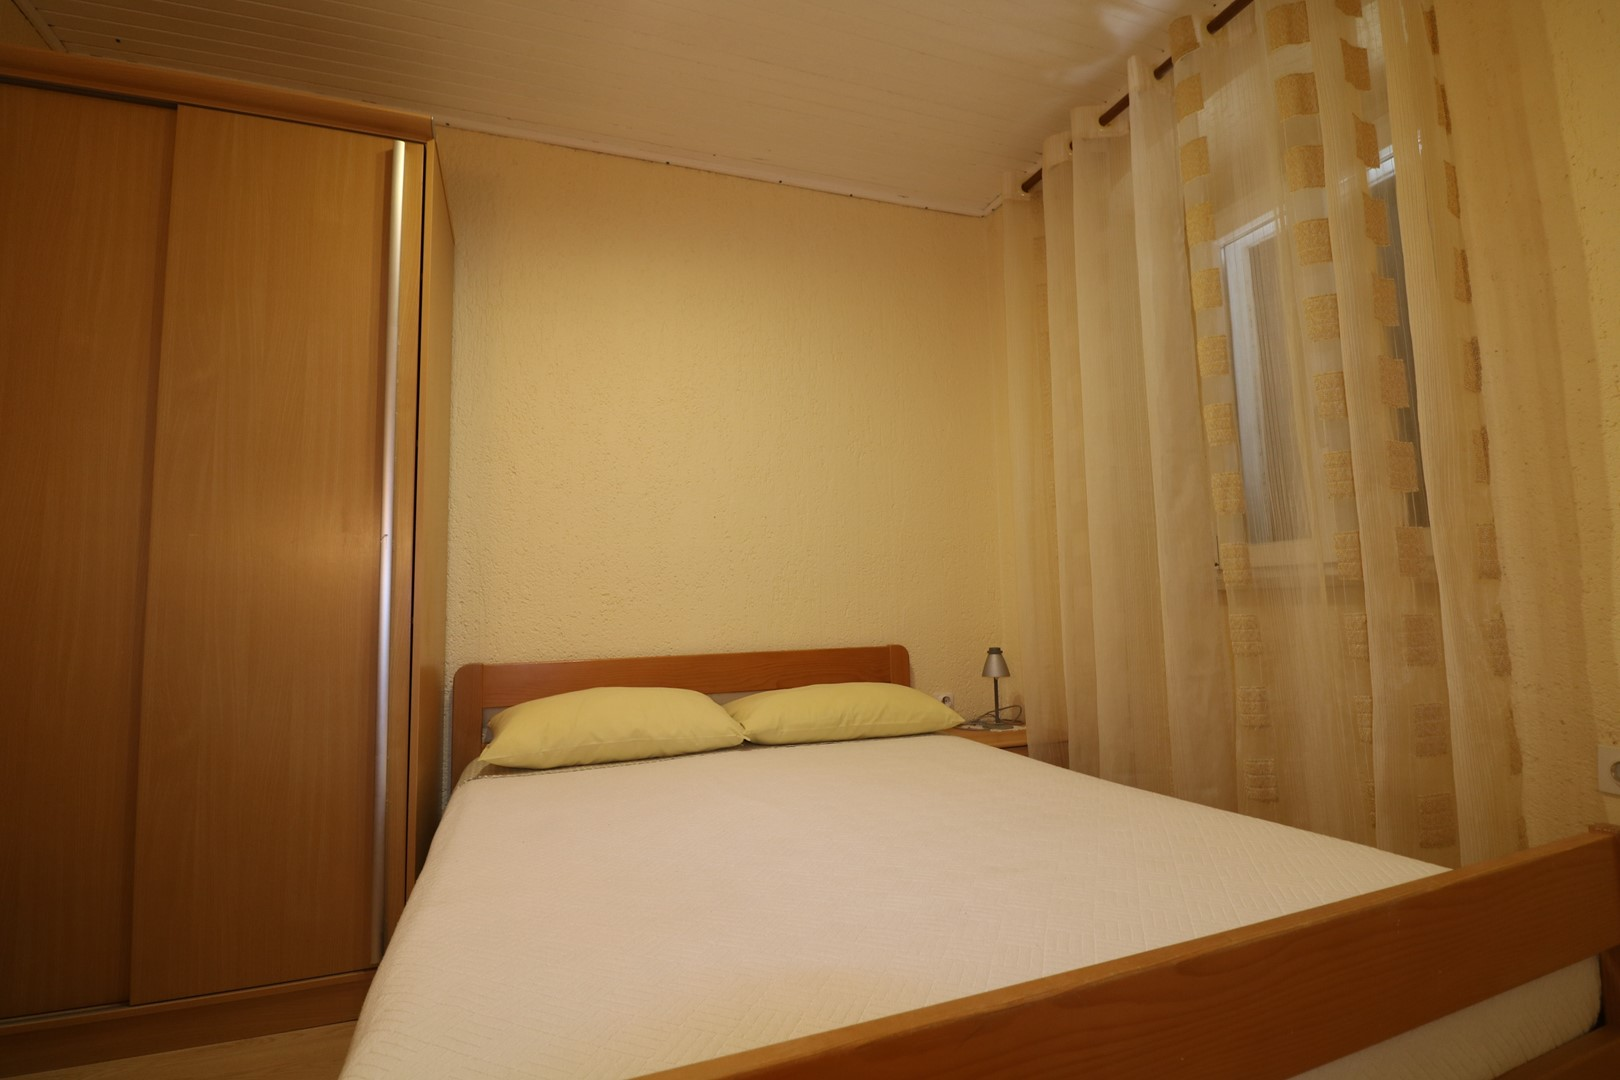 Ferienwohnung Apartments Ivo with the Sea View / Apartment Ivo with Beautiful Sea View (2616230), Baška, Insel Krk, Kvarner, Kroatien, Bild 13